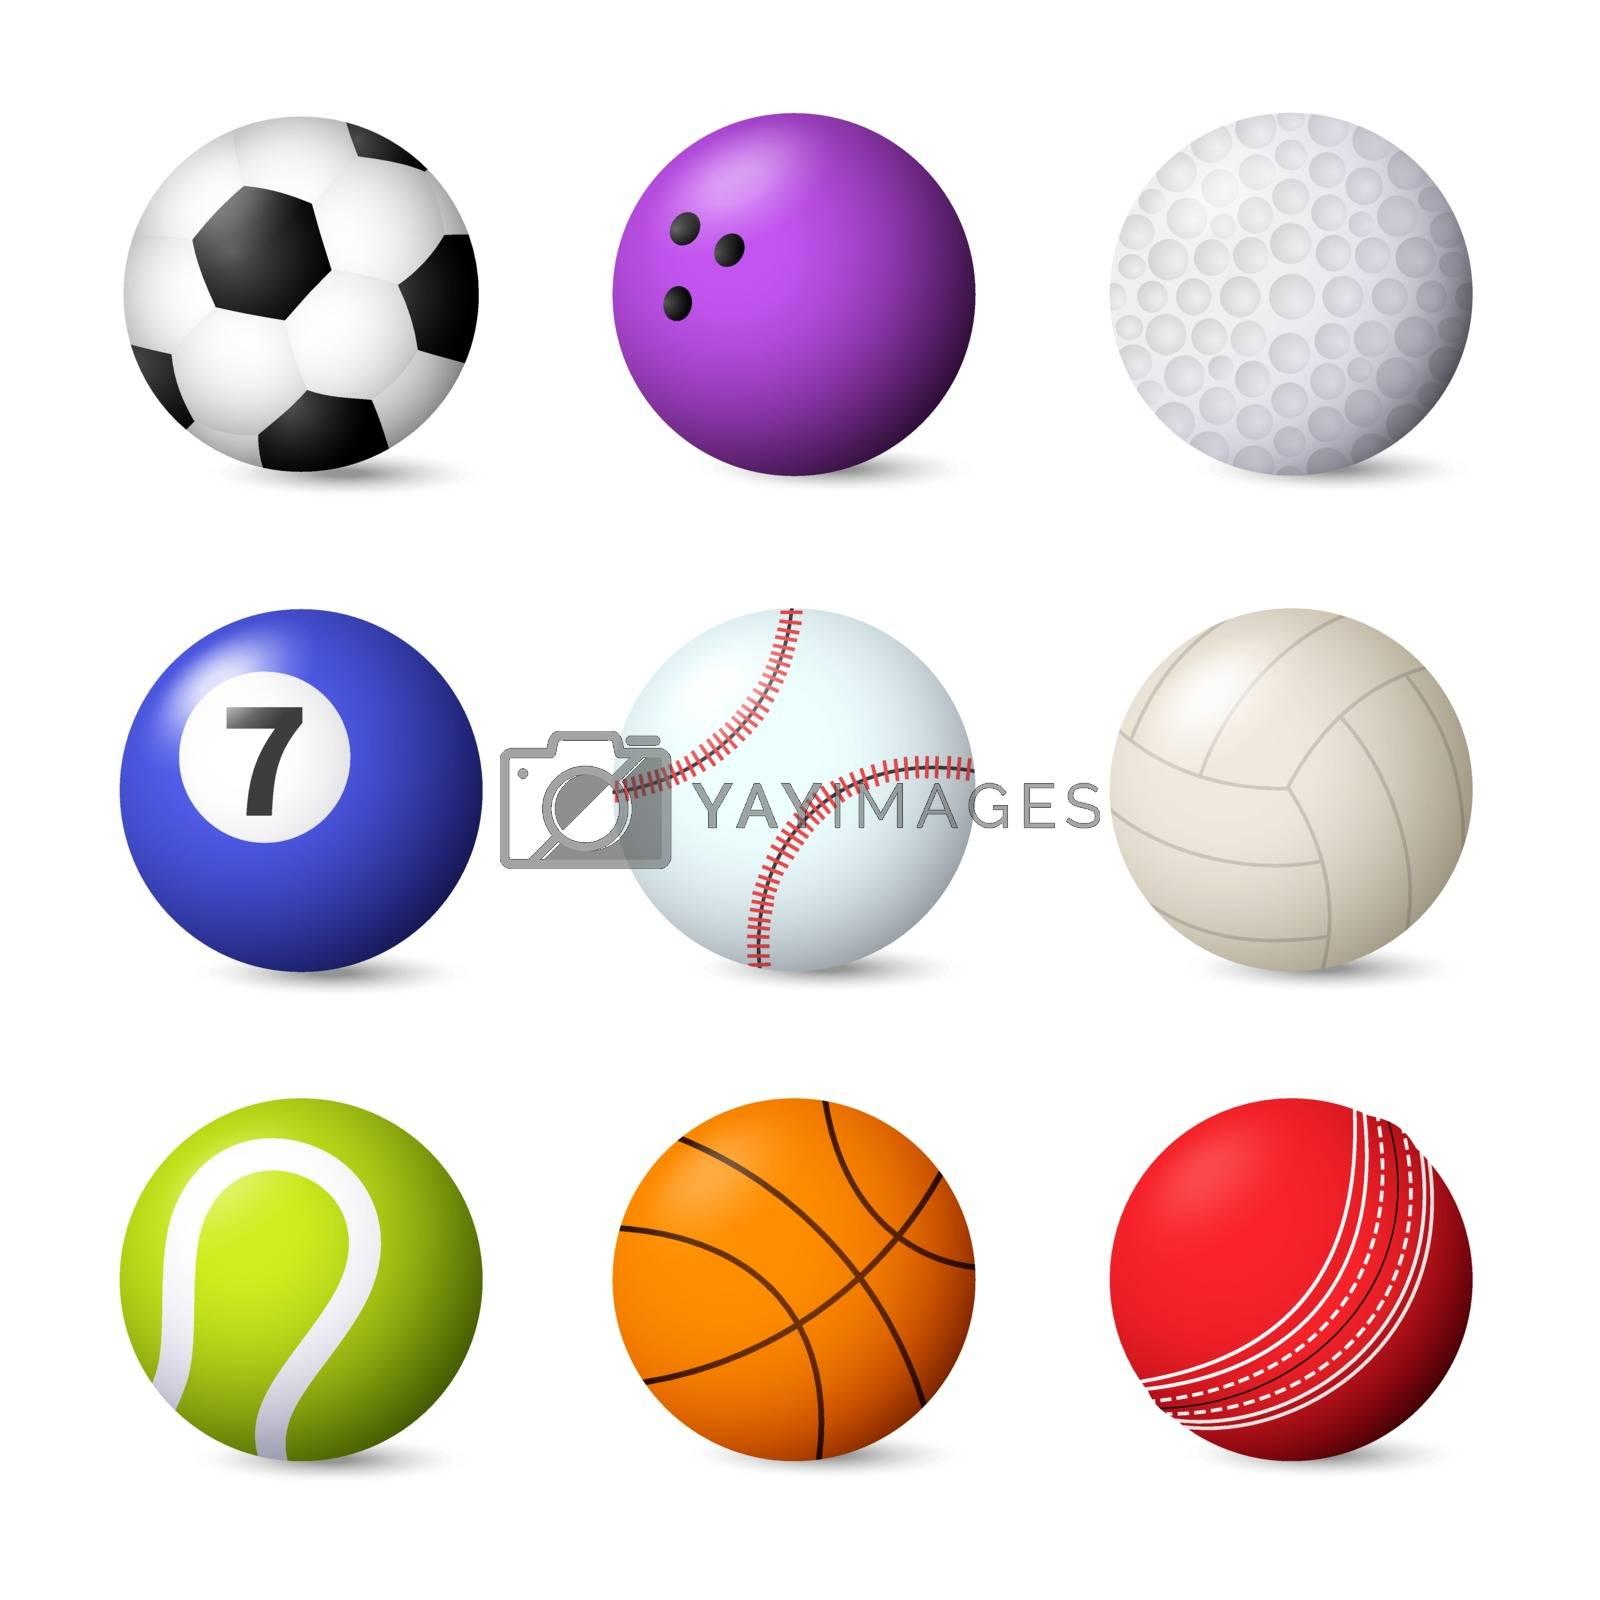 Balls set vector illustration. Bowling, baseball, football, snooker, tennis. Ball games concept. Vector illustration can be used for topics like sport, leisure, hobby